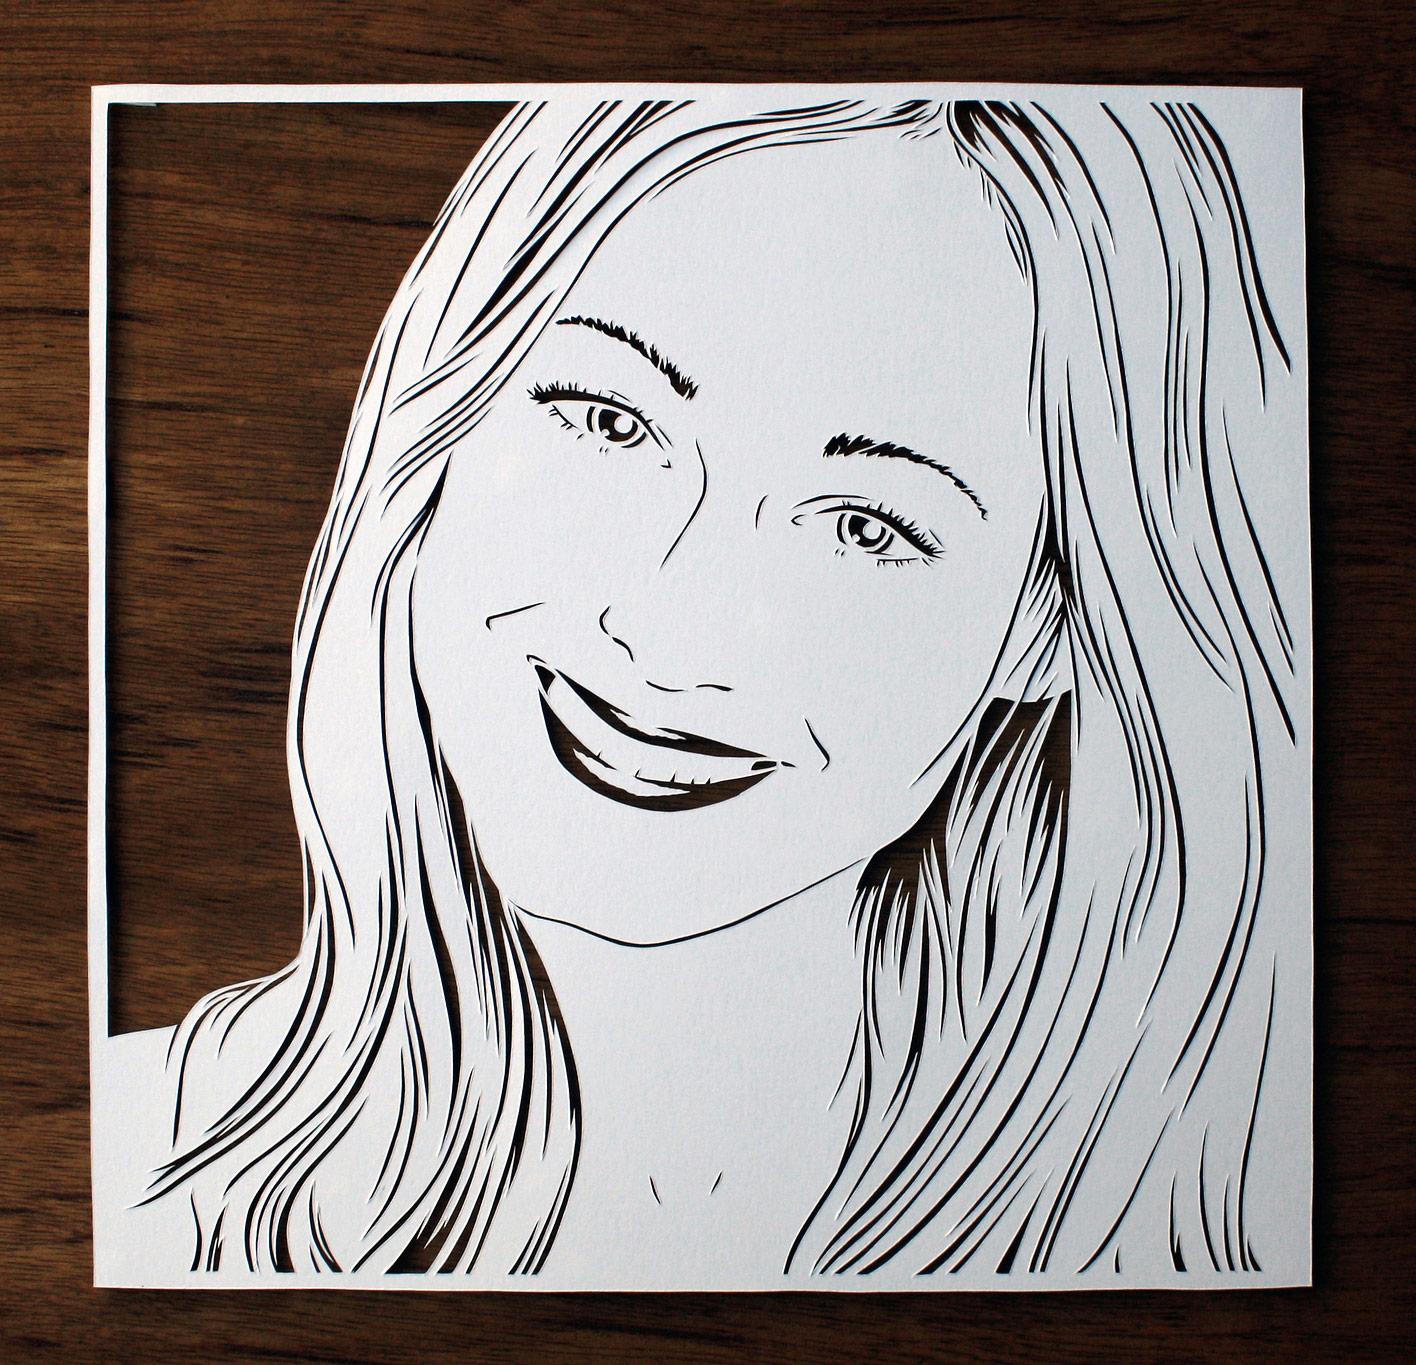 papercut portrait illustration of pretty blond woman